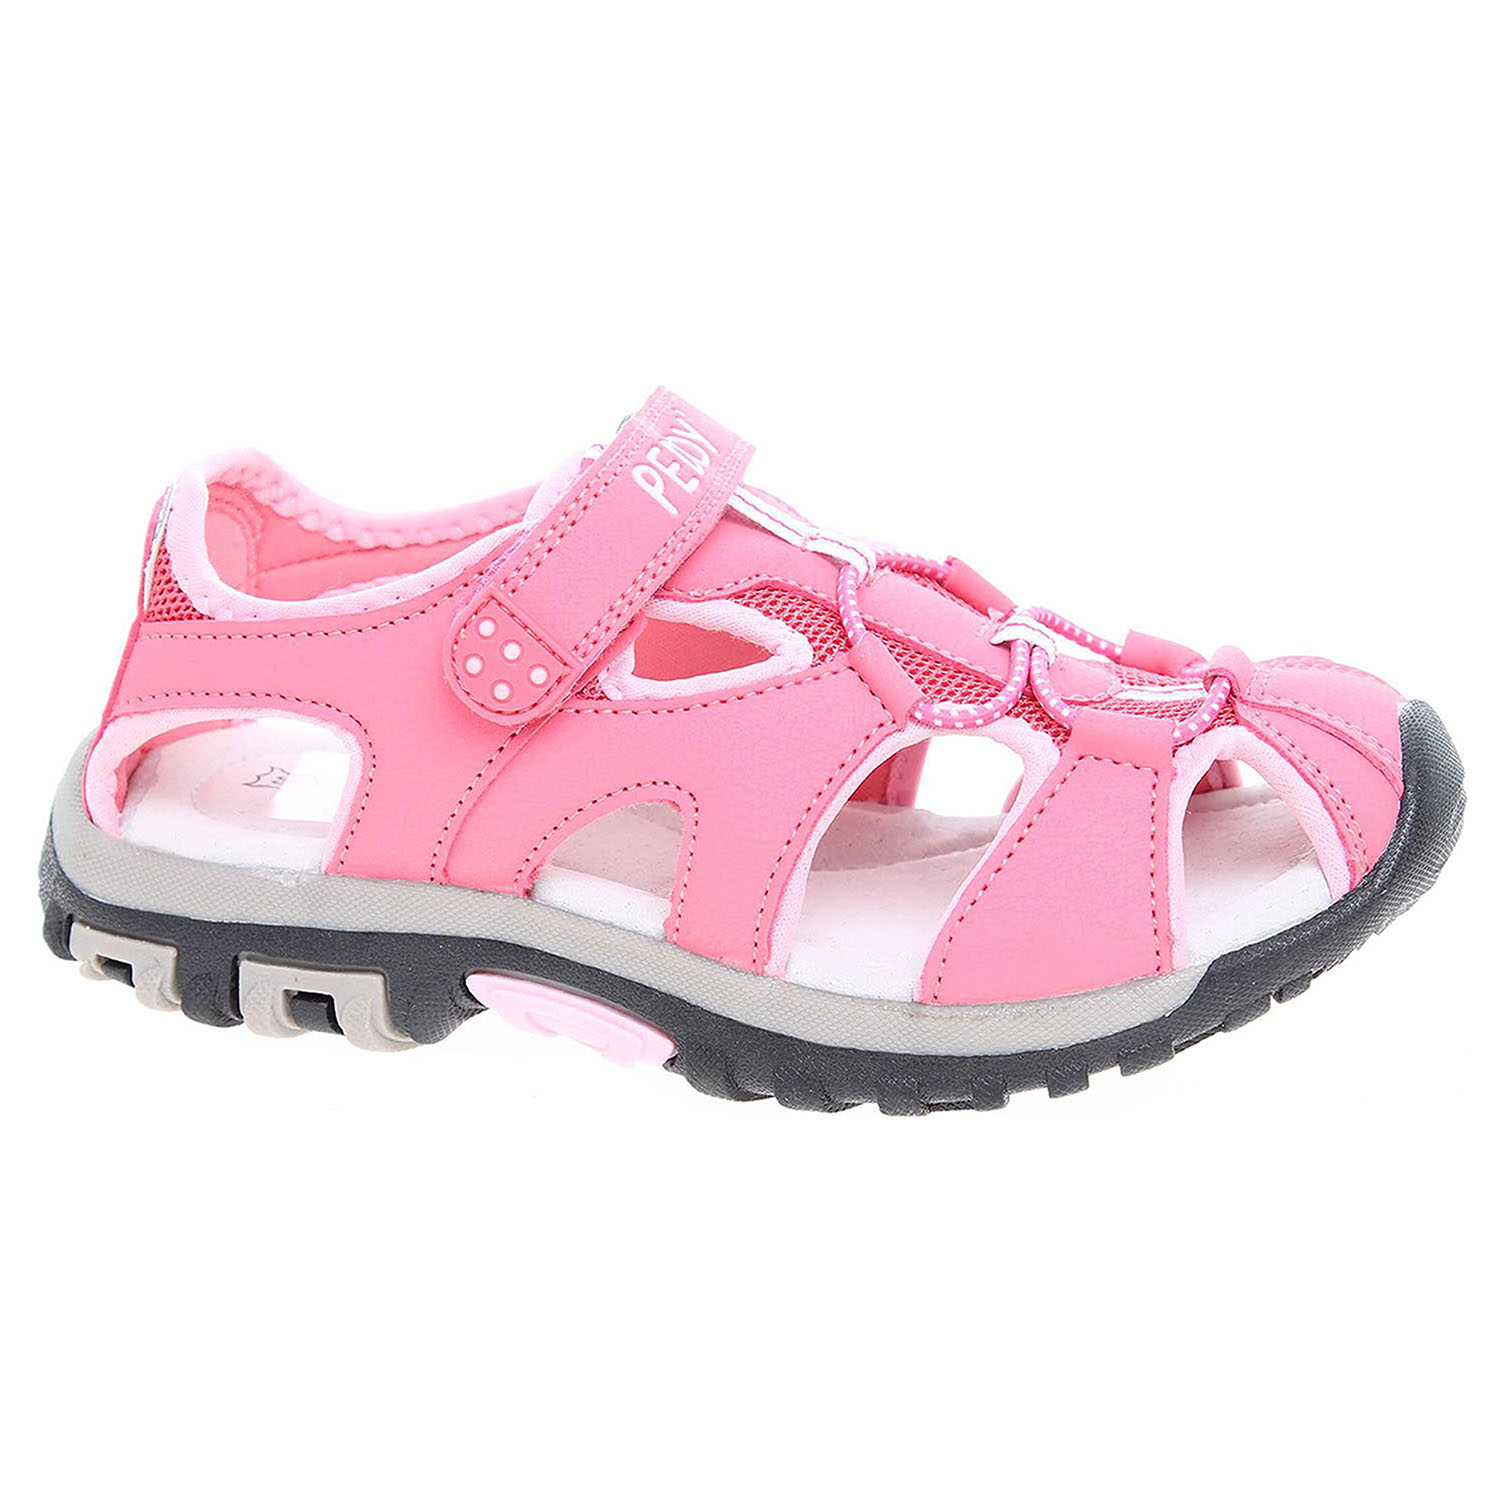 23633b65d2de Ecco Dívčí sandály Peddy PY-512-35-11 růžové 26100110